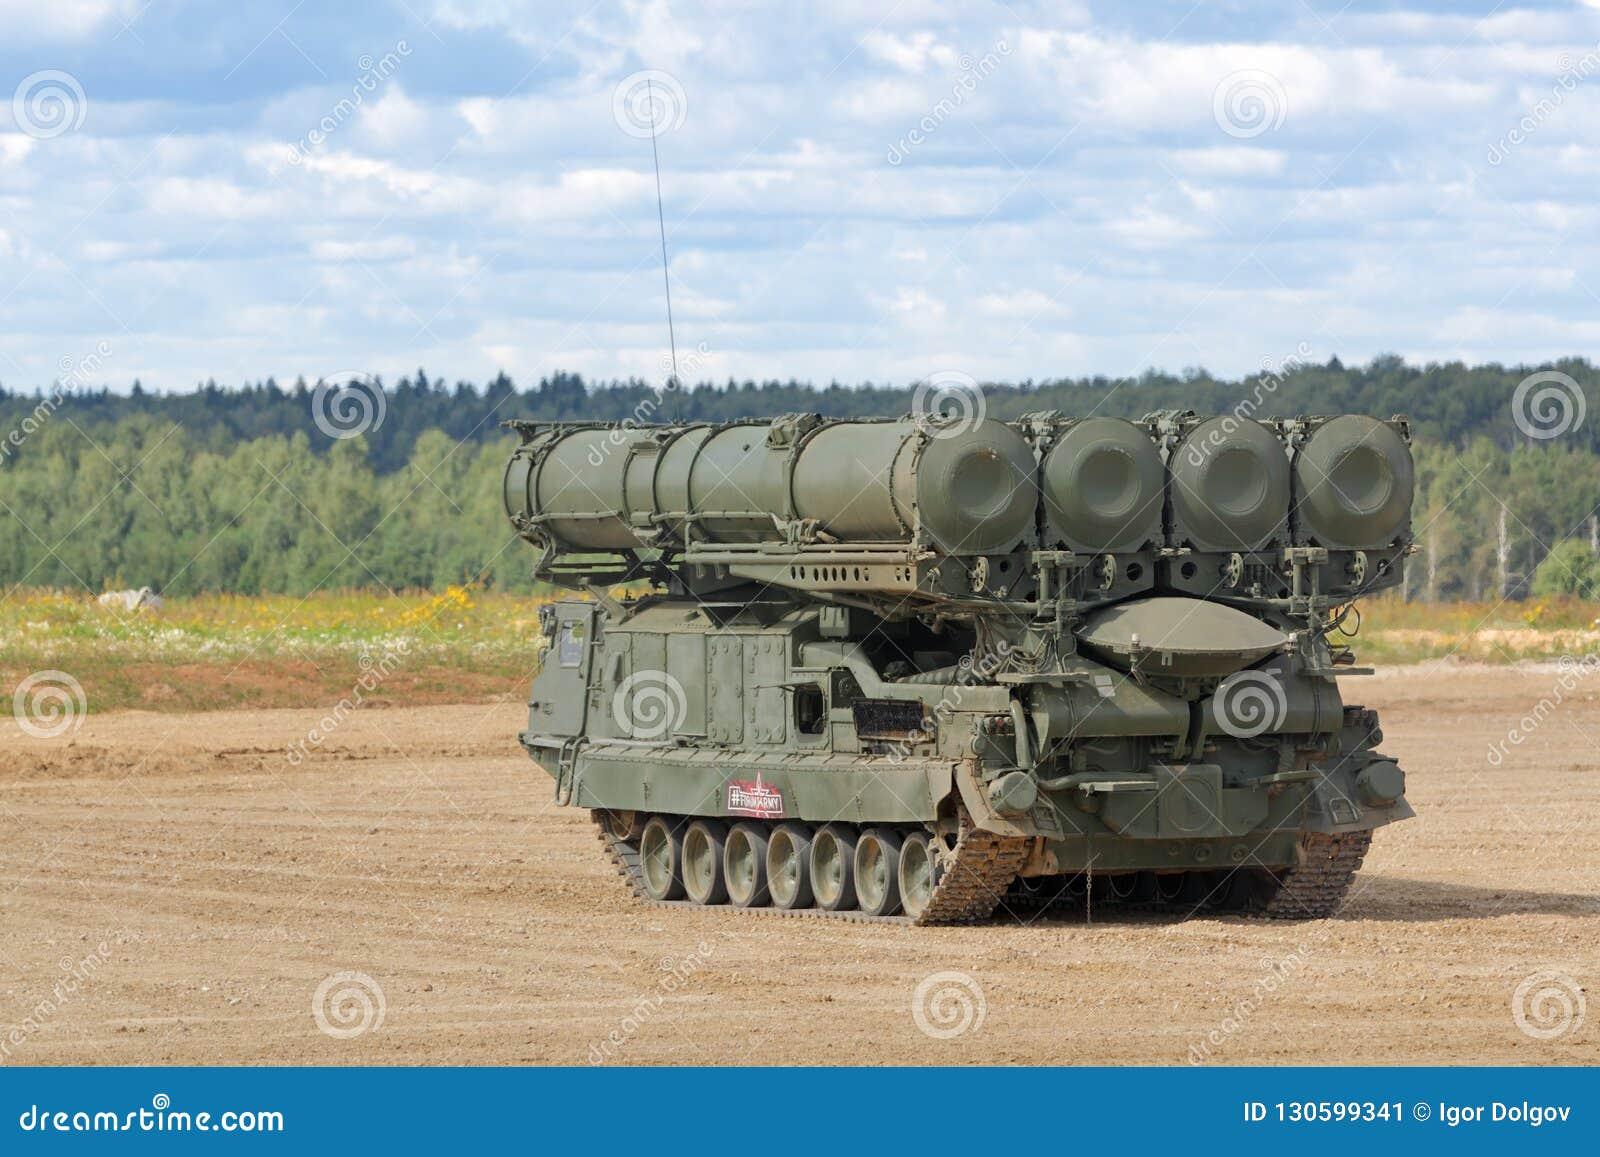 Canoniac Launcher Air Defense S-300 Editorial Photo ...